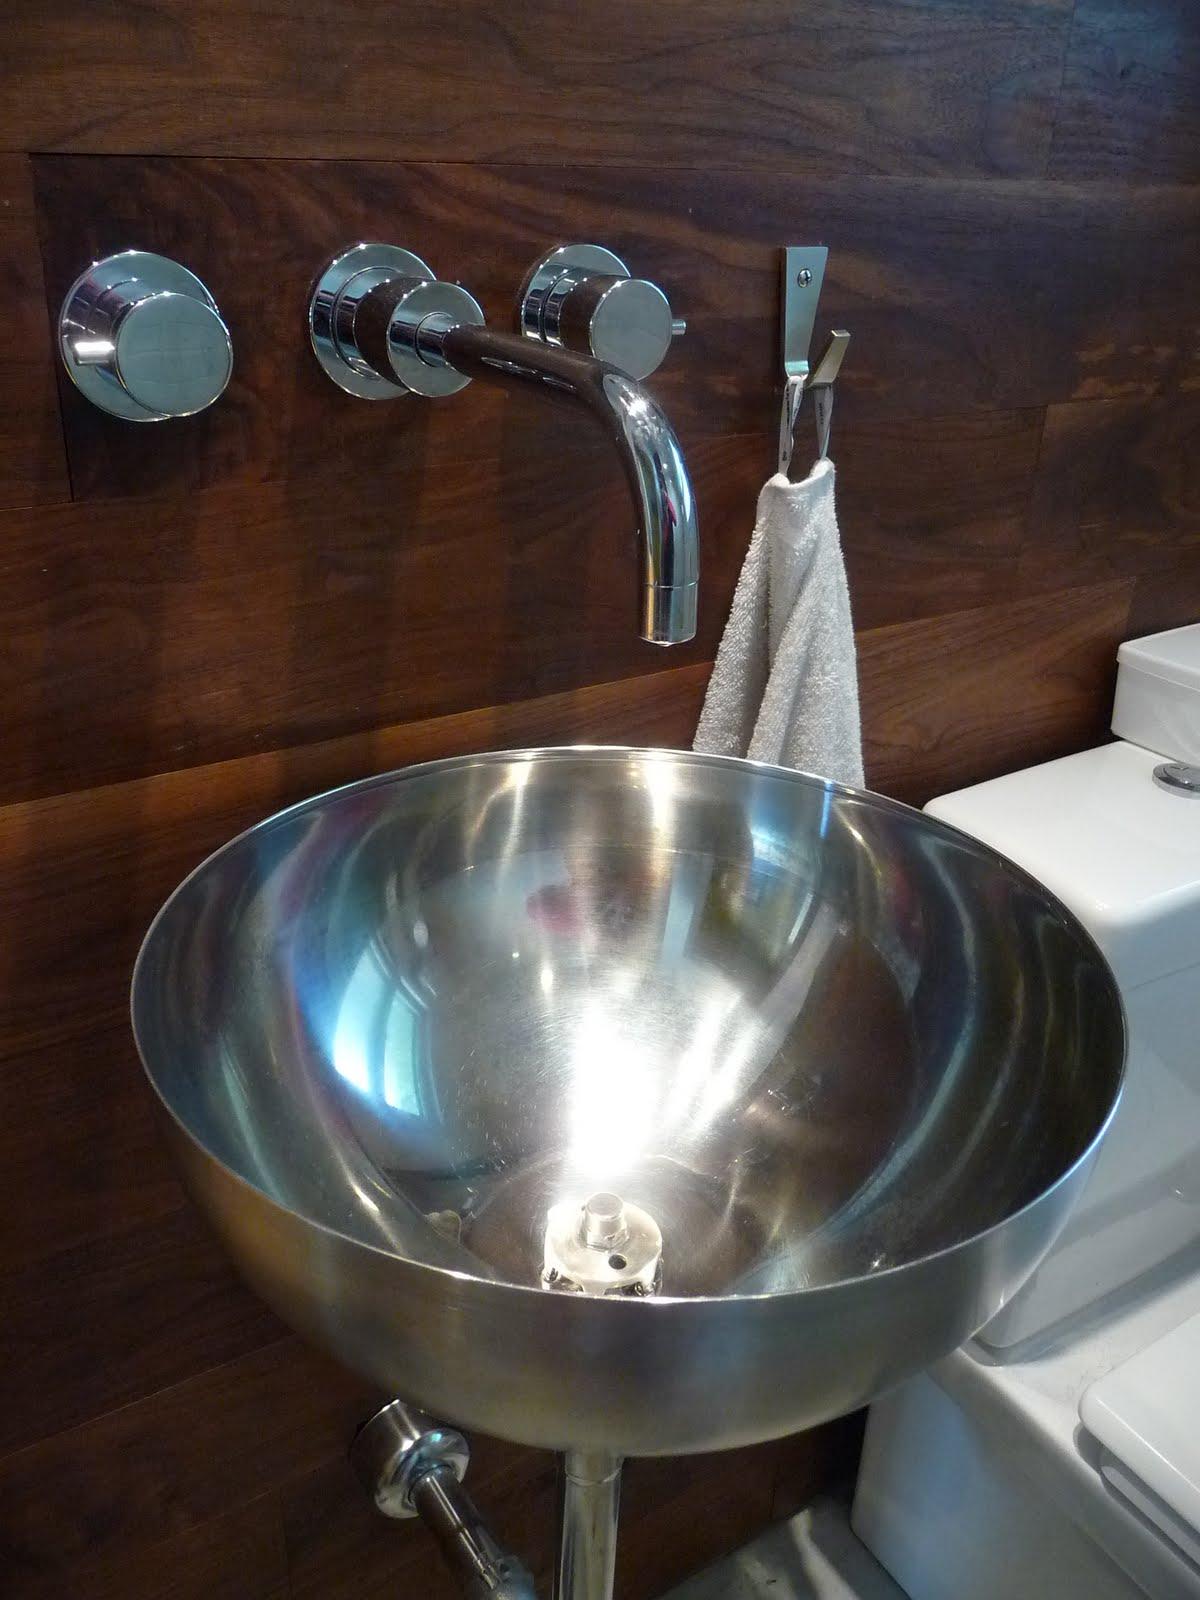 Ideal IKEA salad bowl sink